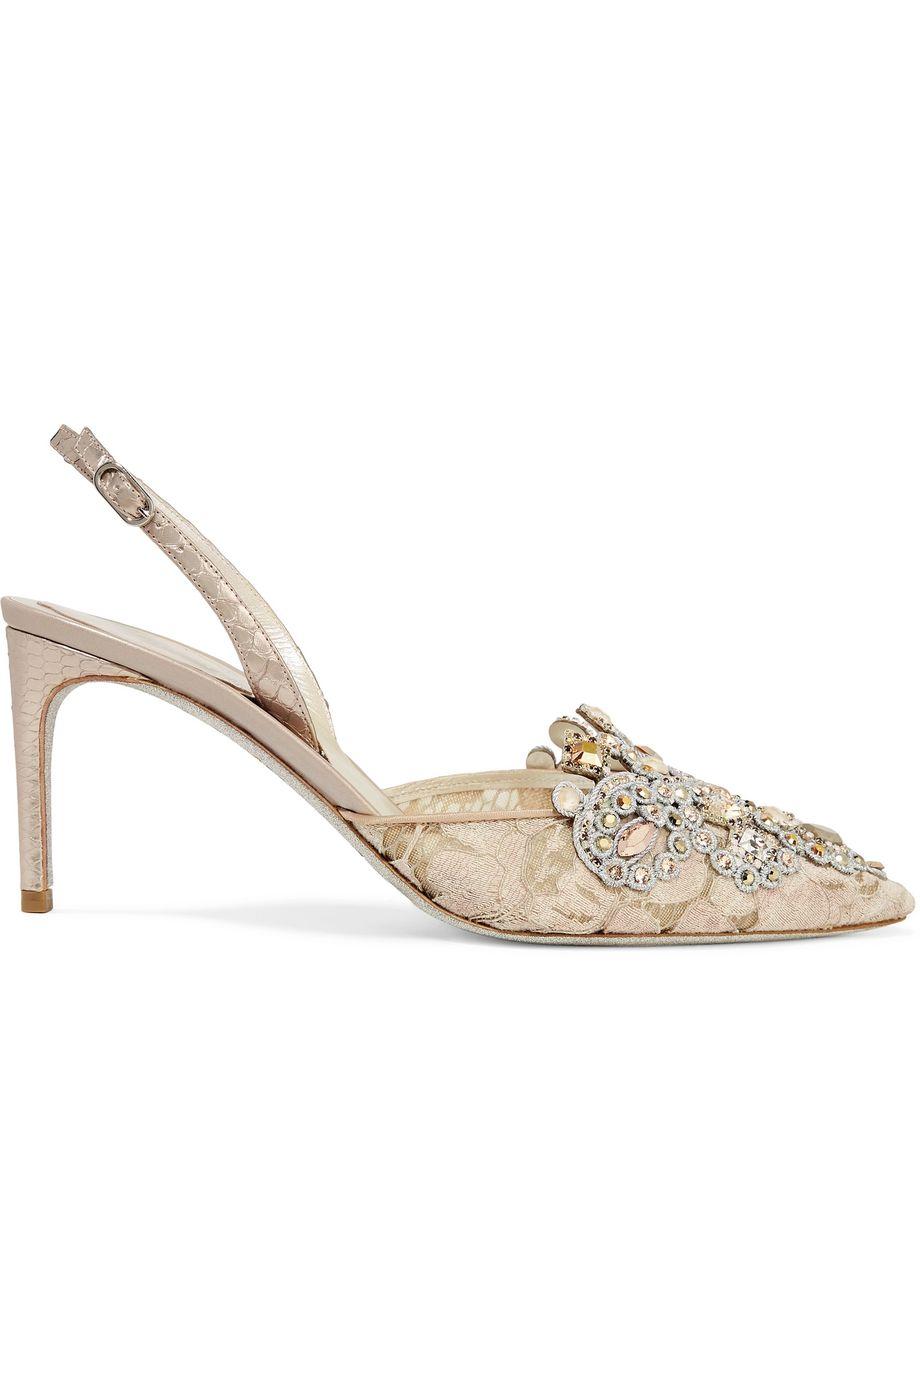 René Caovilla Veneziana embellished lace and satin slingback pumps